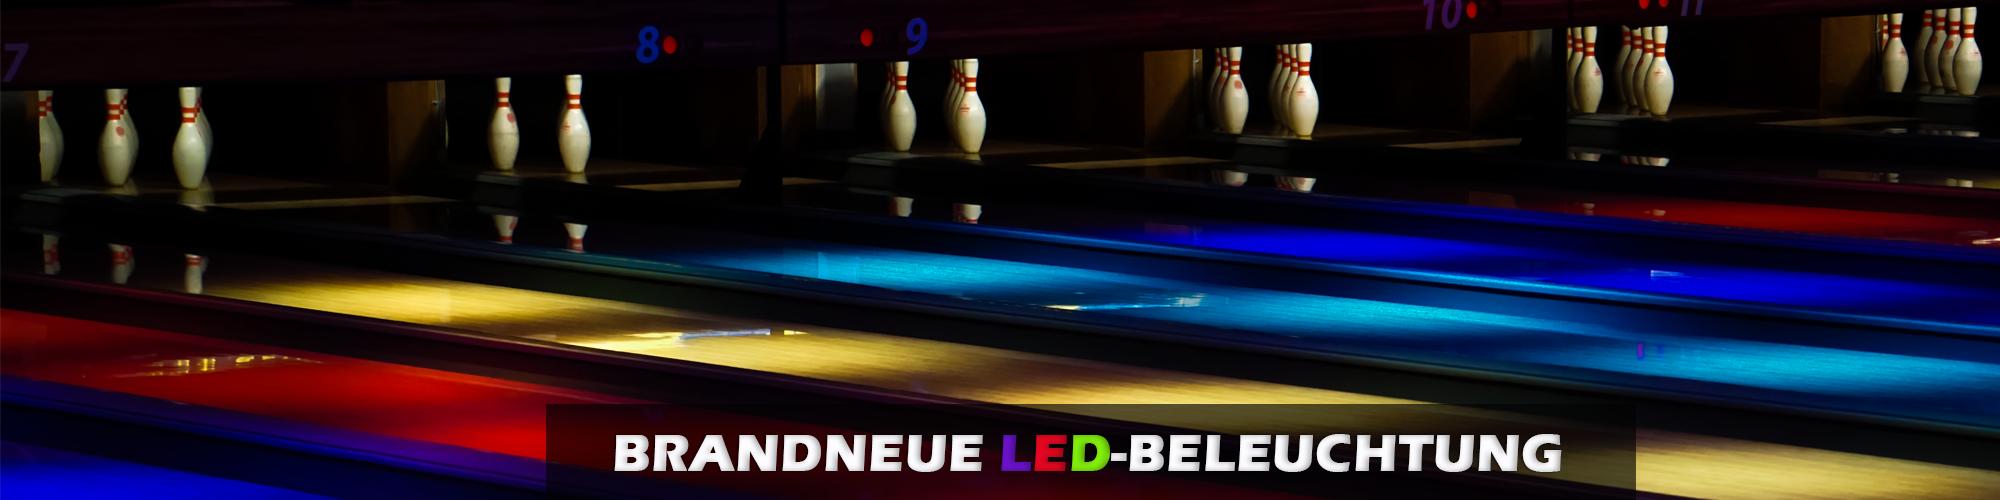 Slider LED-Beleuchtung_02